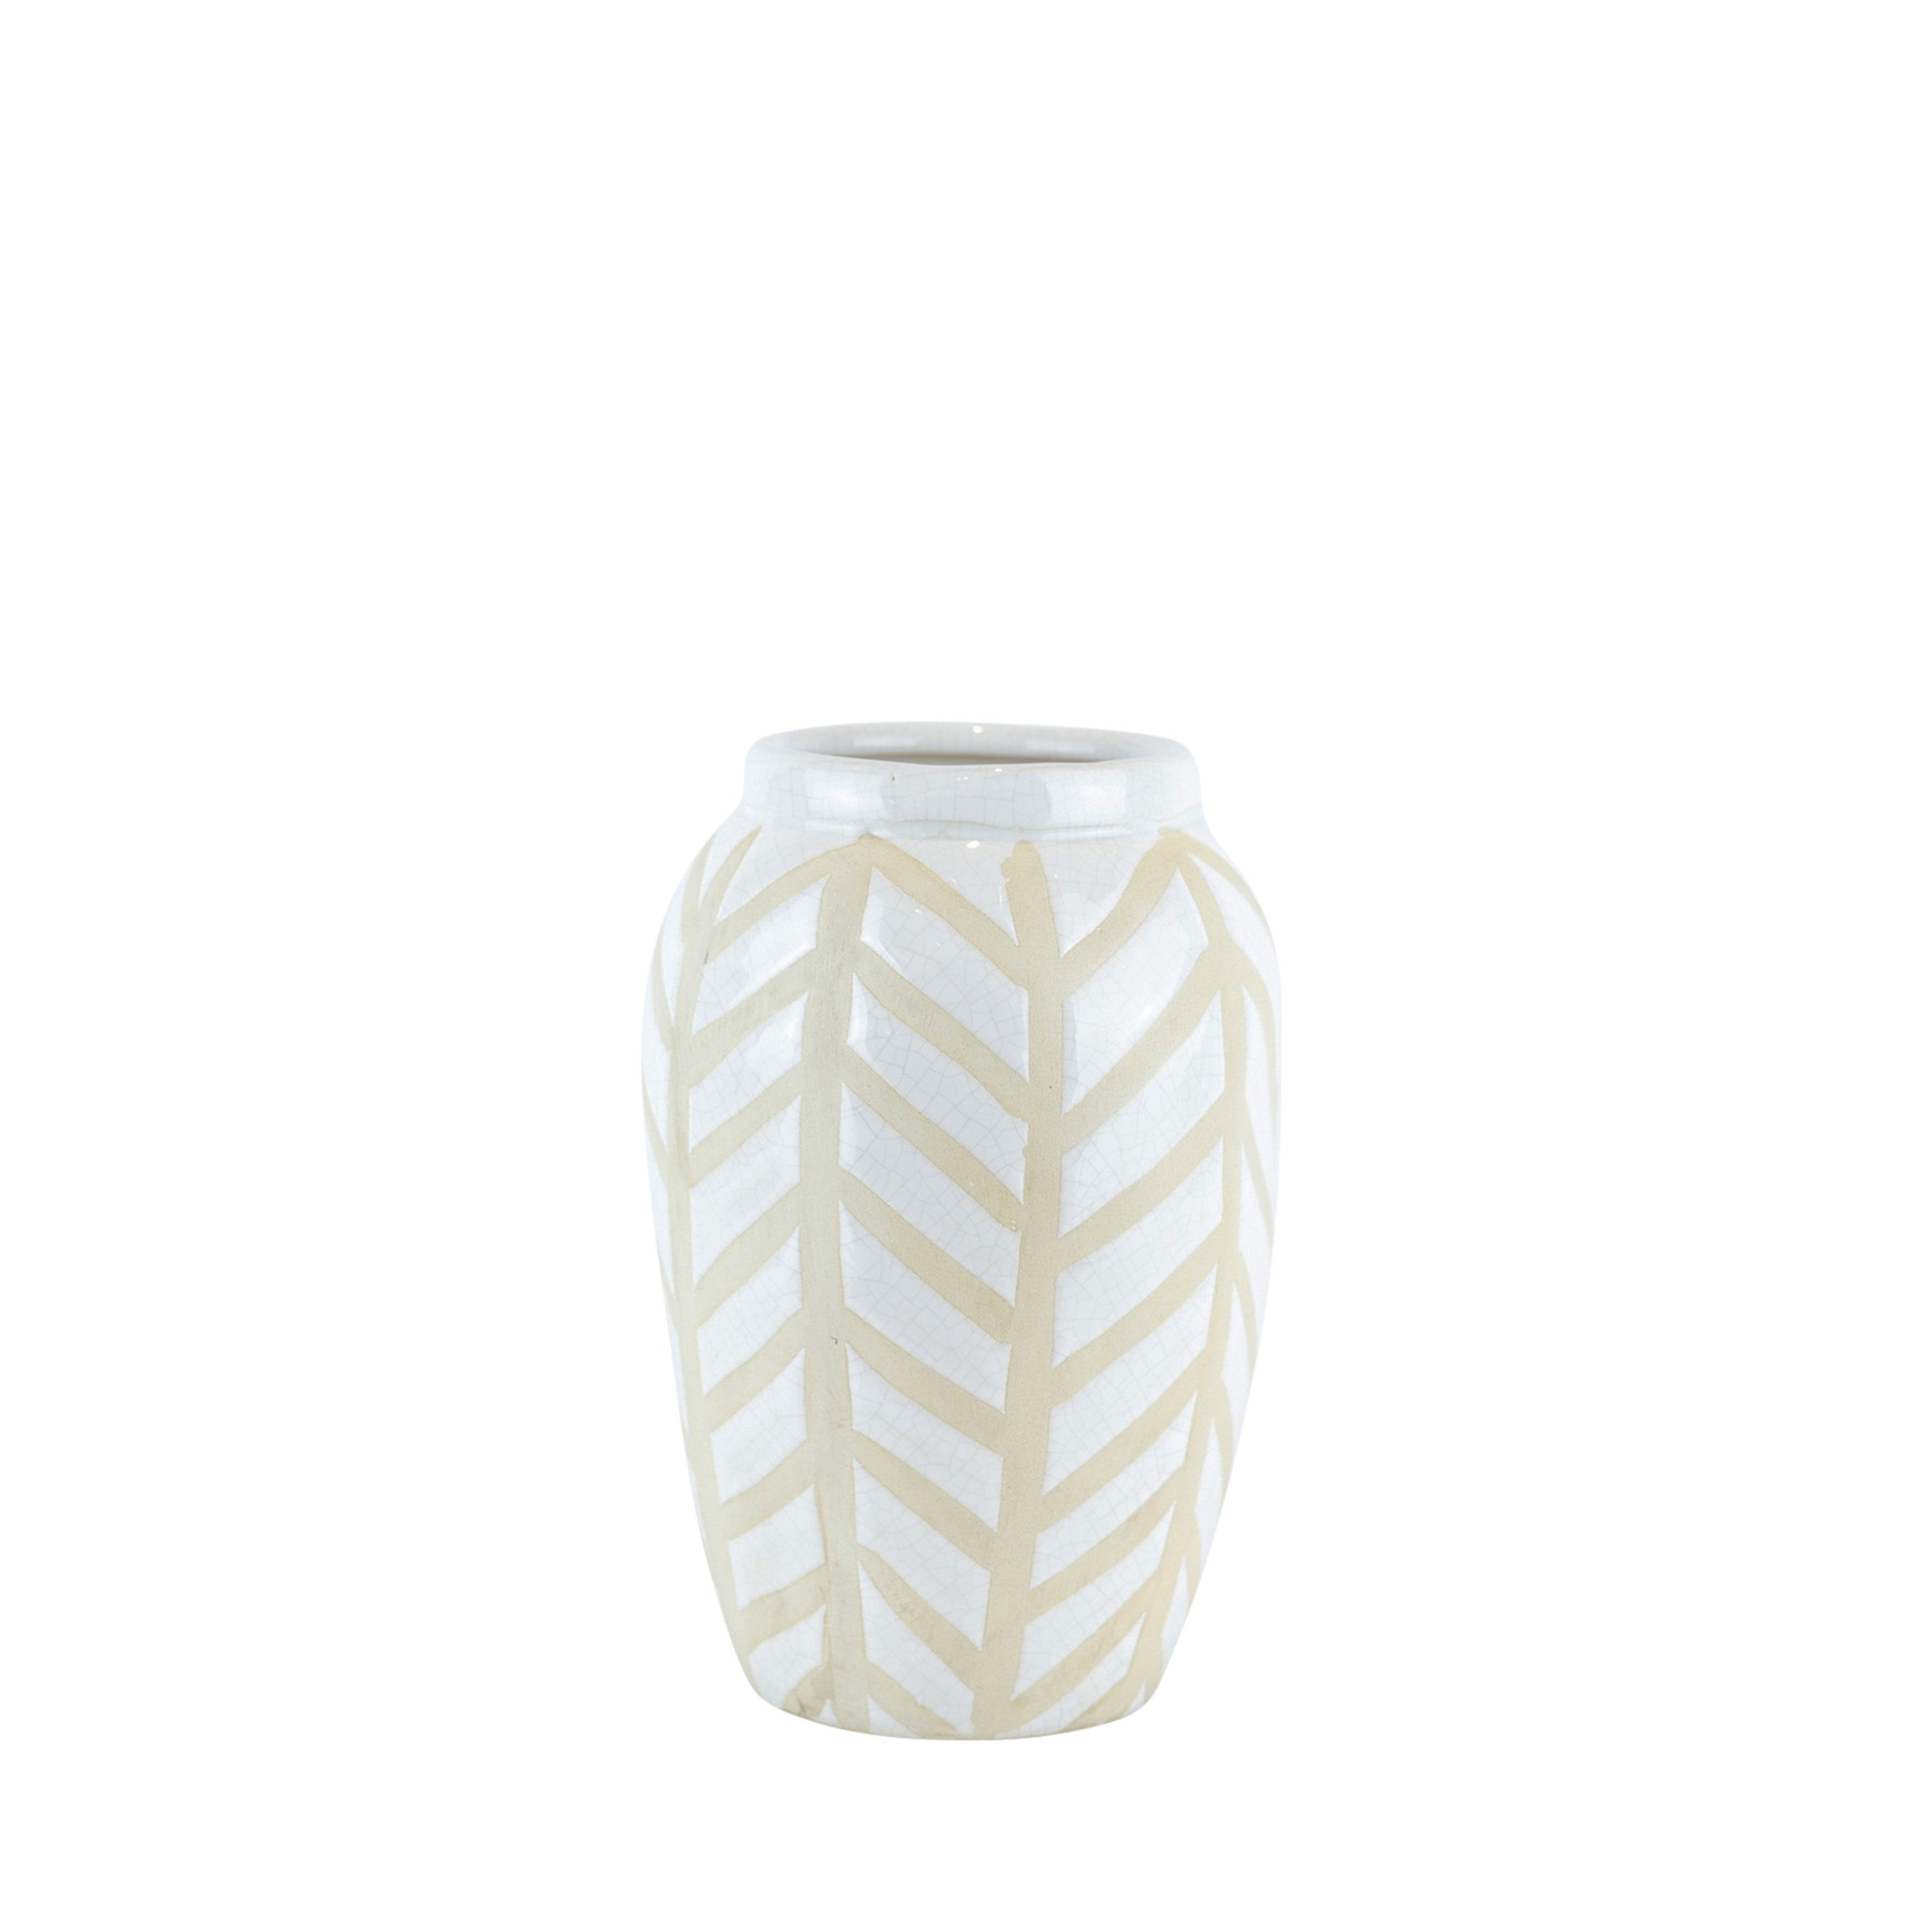 Decorative Ceramic Vase with Unique Pattern, White and Beige